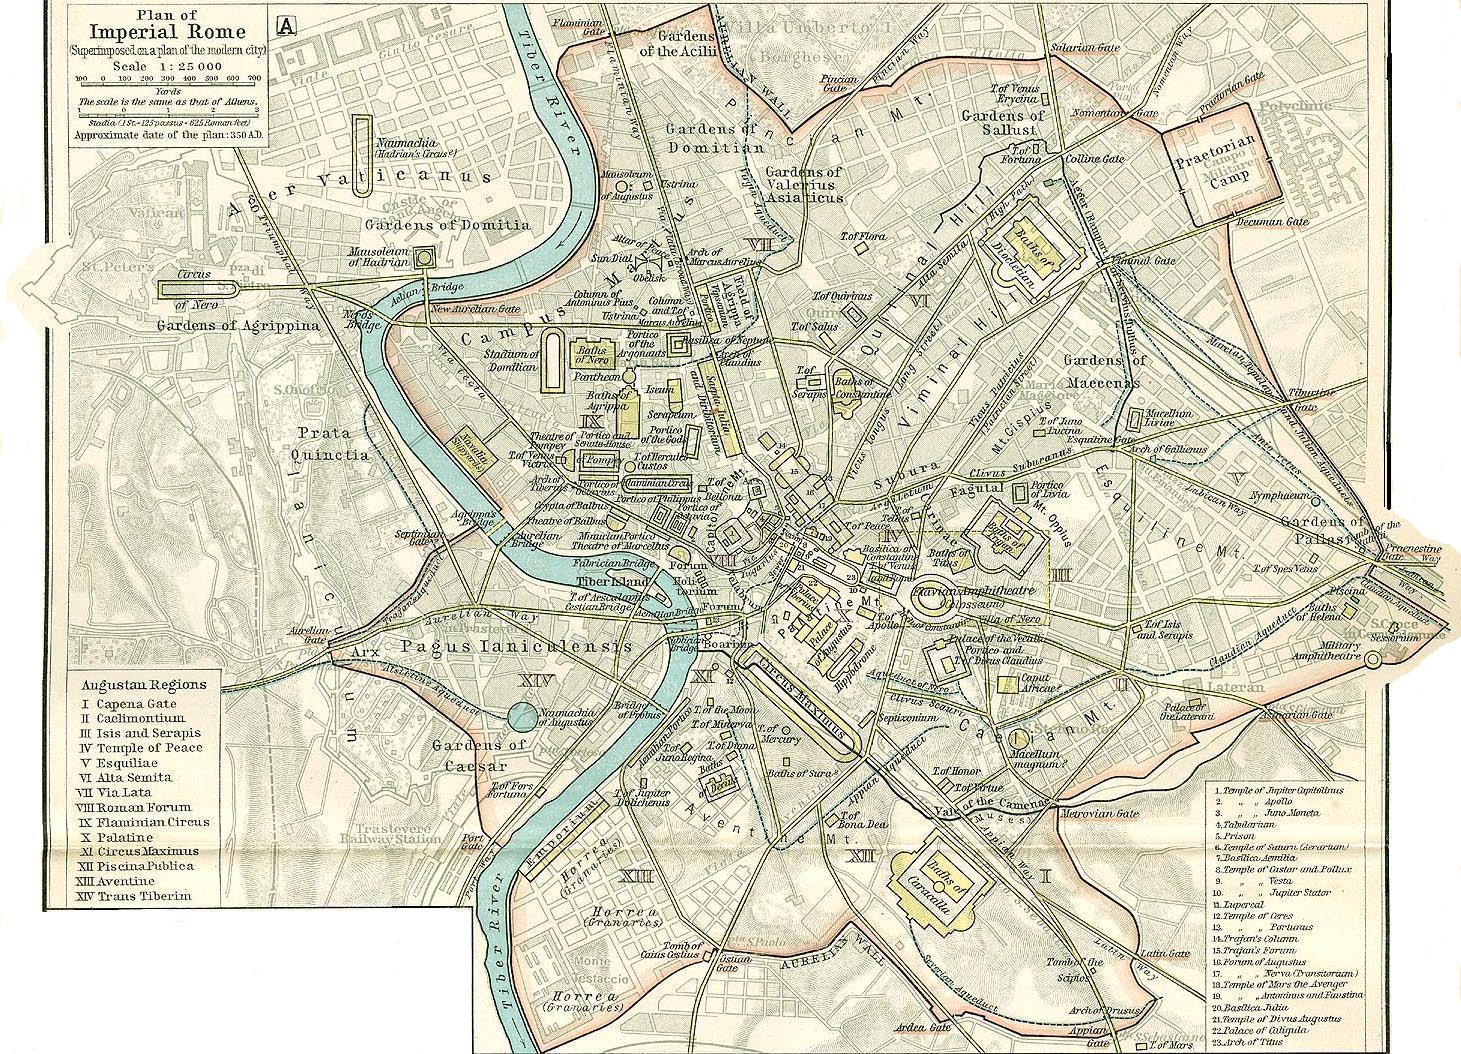 FileMap of Imperial Rome by William R Shepherd died 1934jpg